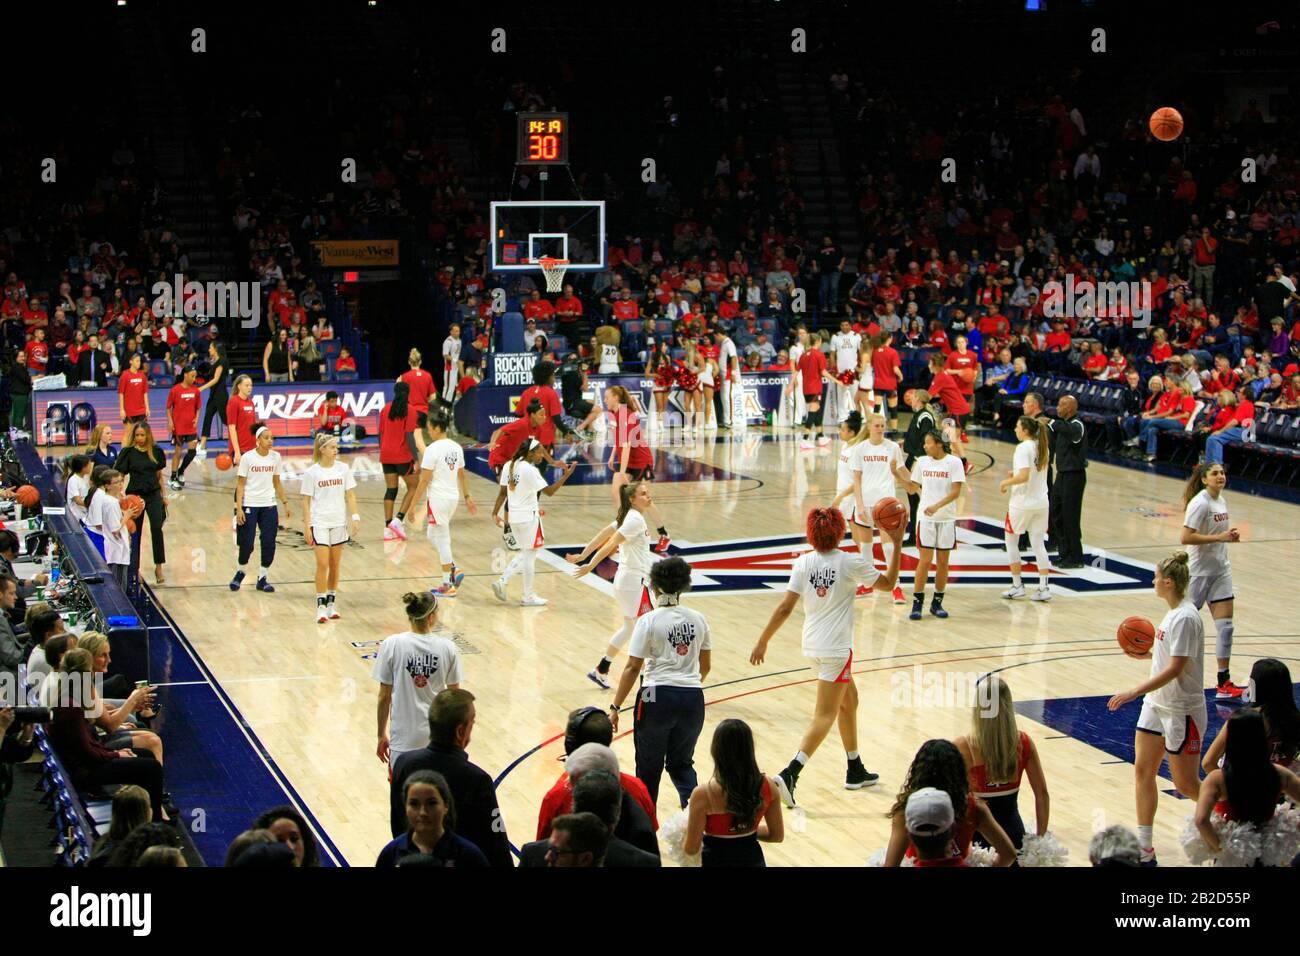 Arizona Vs Stanford Girls University Basketball game at the UofA McKale Memorial center basketball arena in Tucson AZ Stock Photo